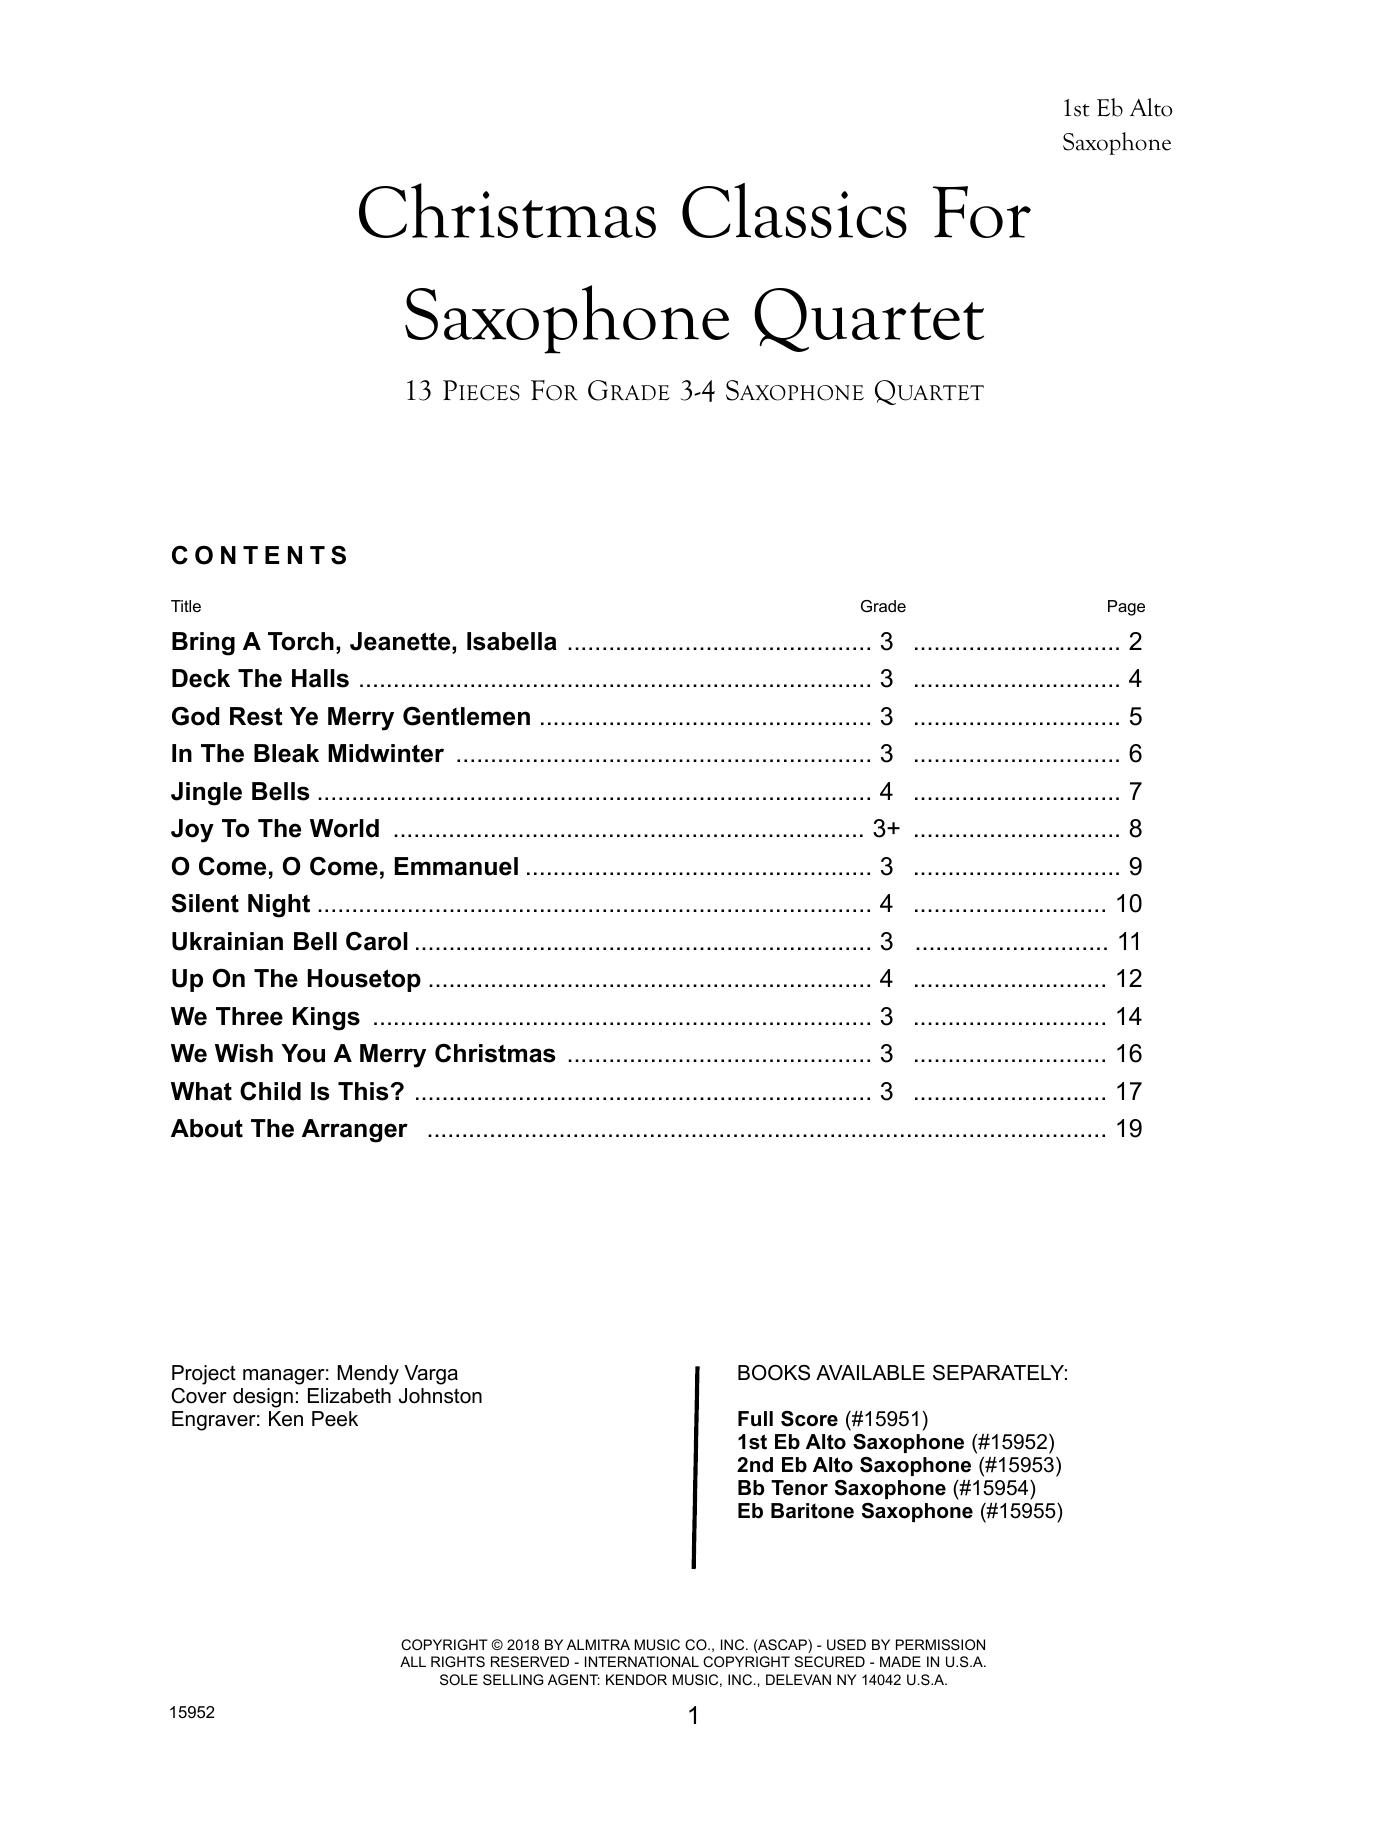 Christmas Classics For Saxophone Quartet - 1st Eb Alto Saxophone Digitale Noten